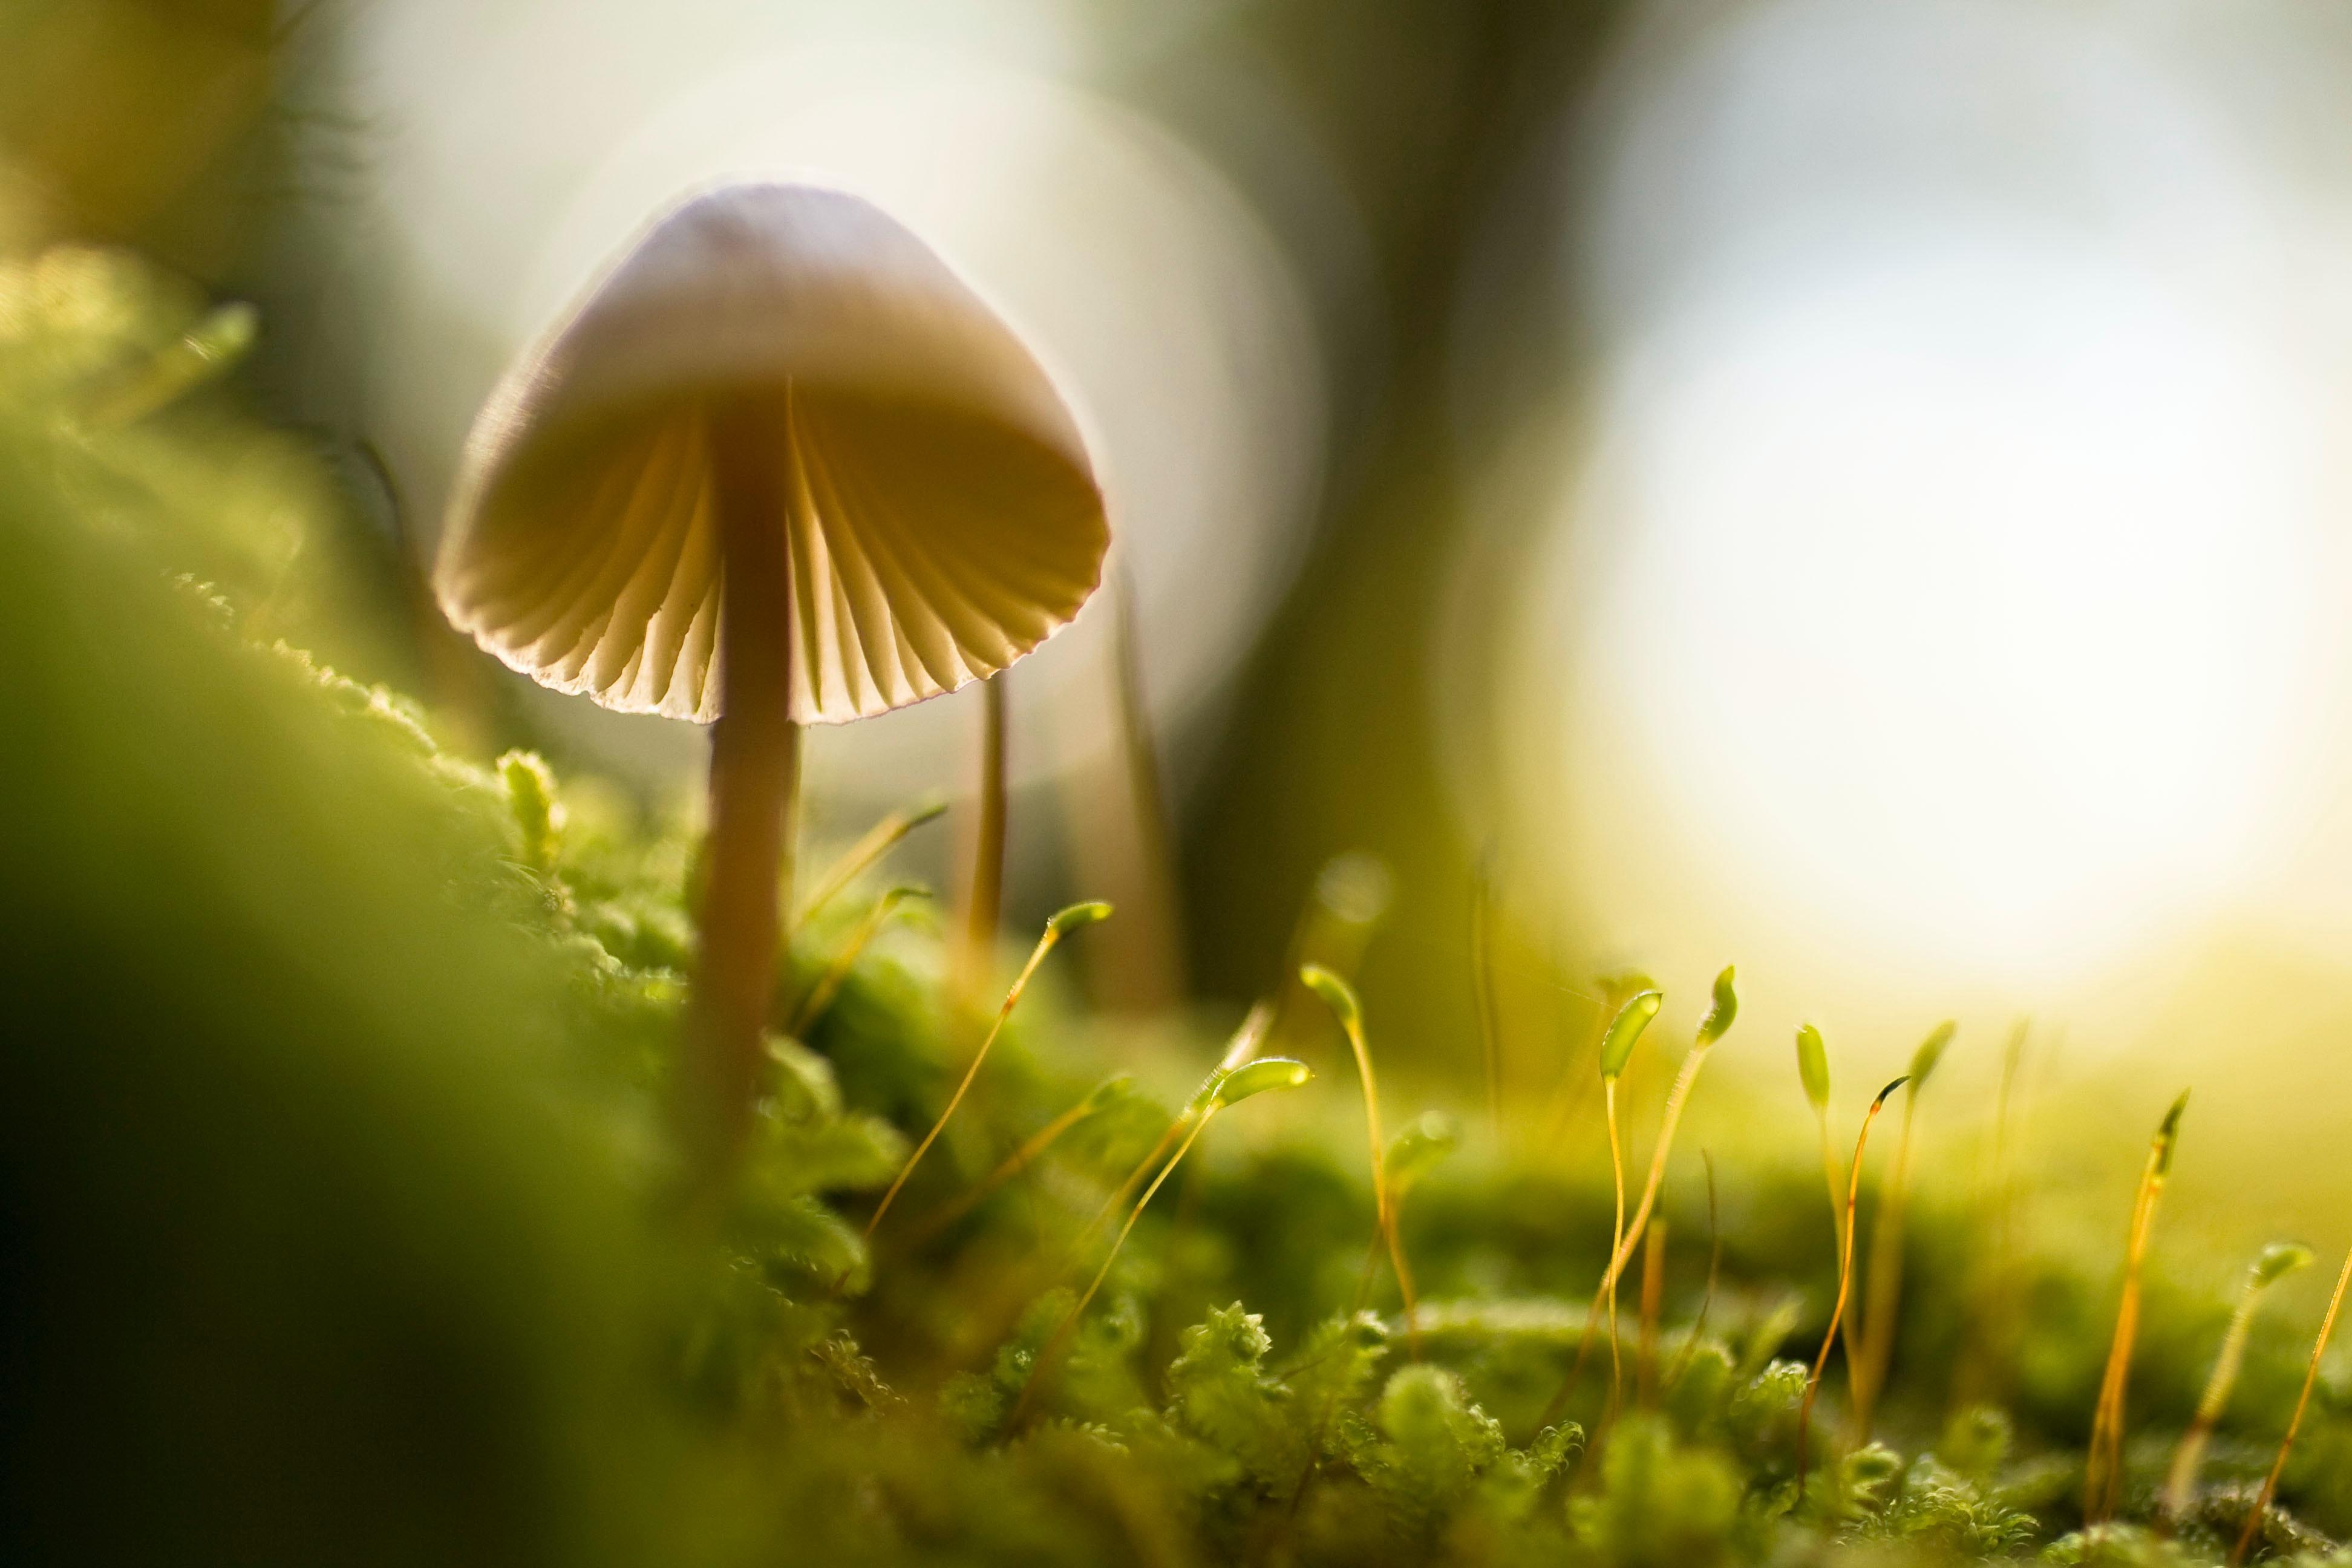 Magic Mushroom Grow Kits - My Personal Plants